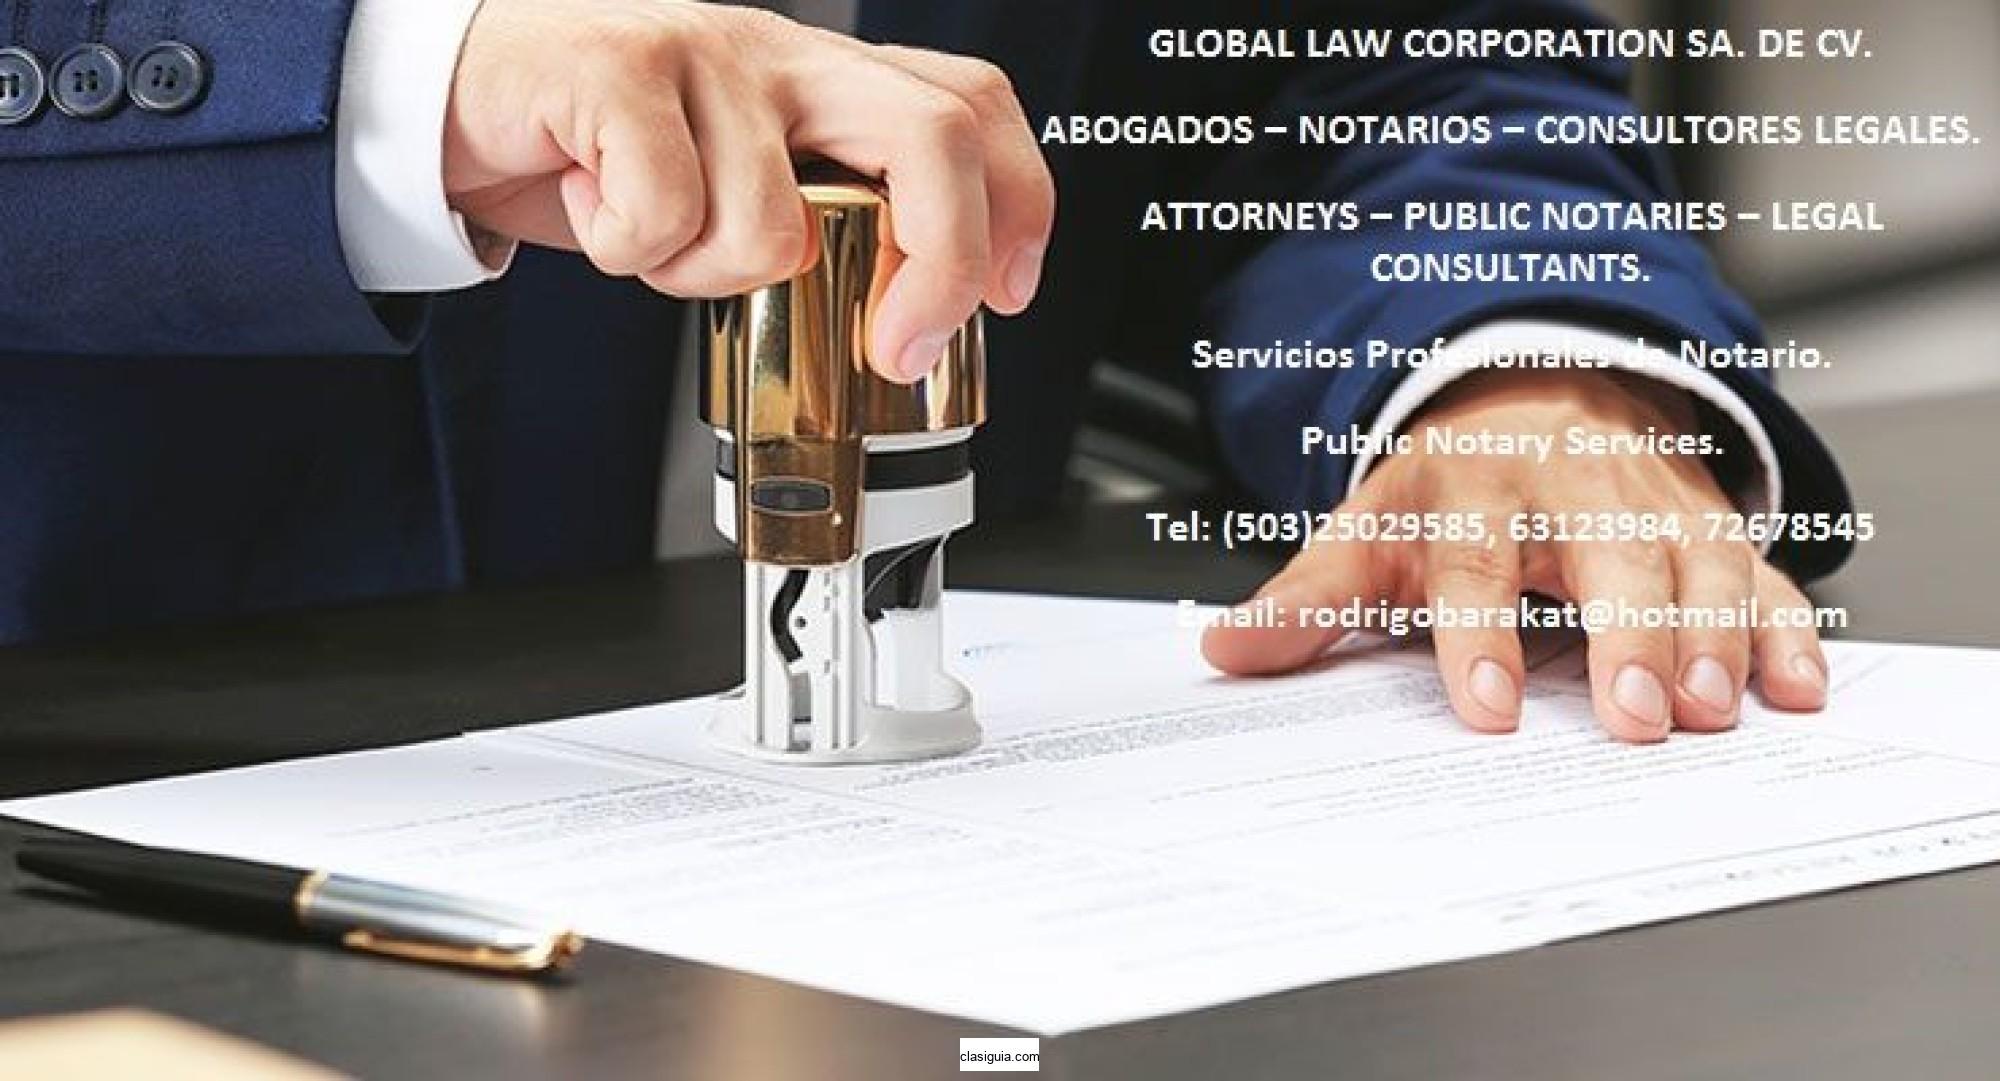 Abogados, Notarios, & Consultores Legales. Attorneys, Public Notaries, & Legal Consultants.